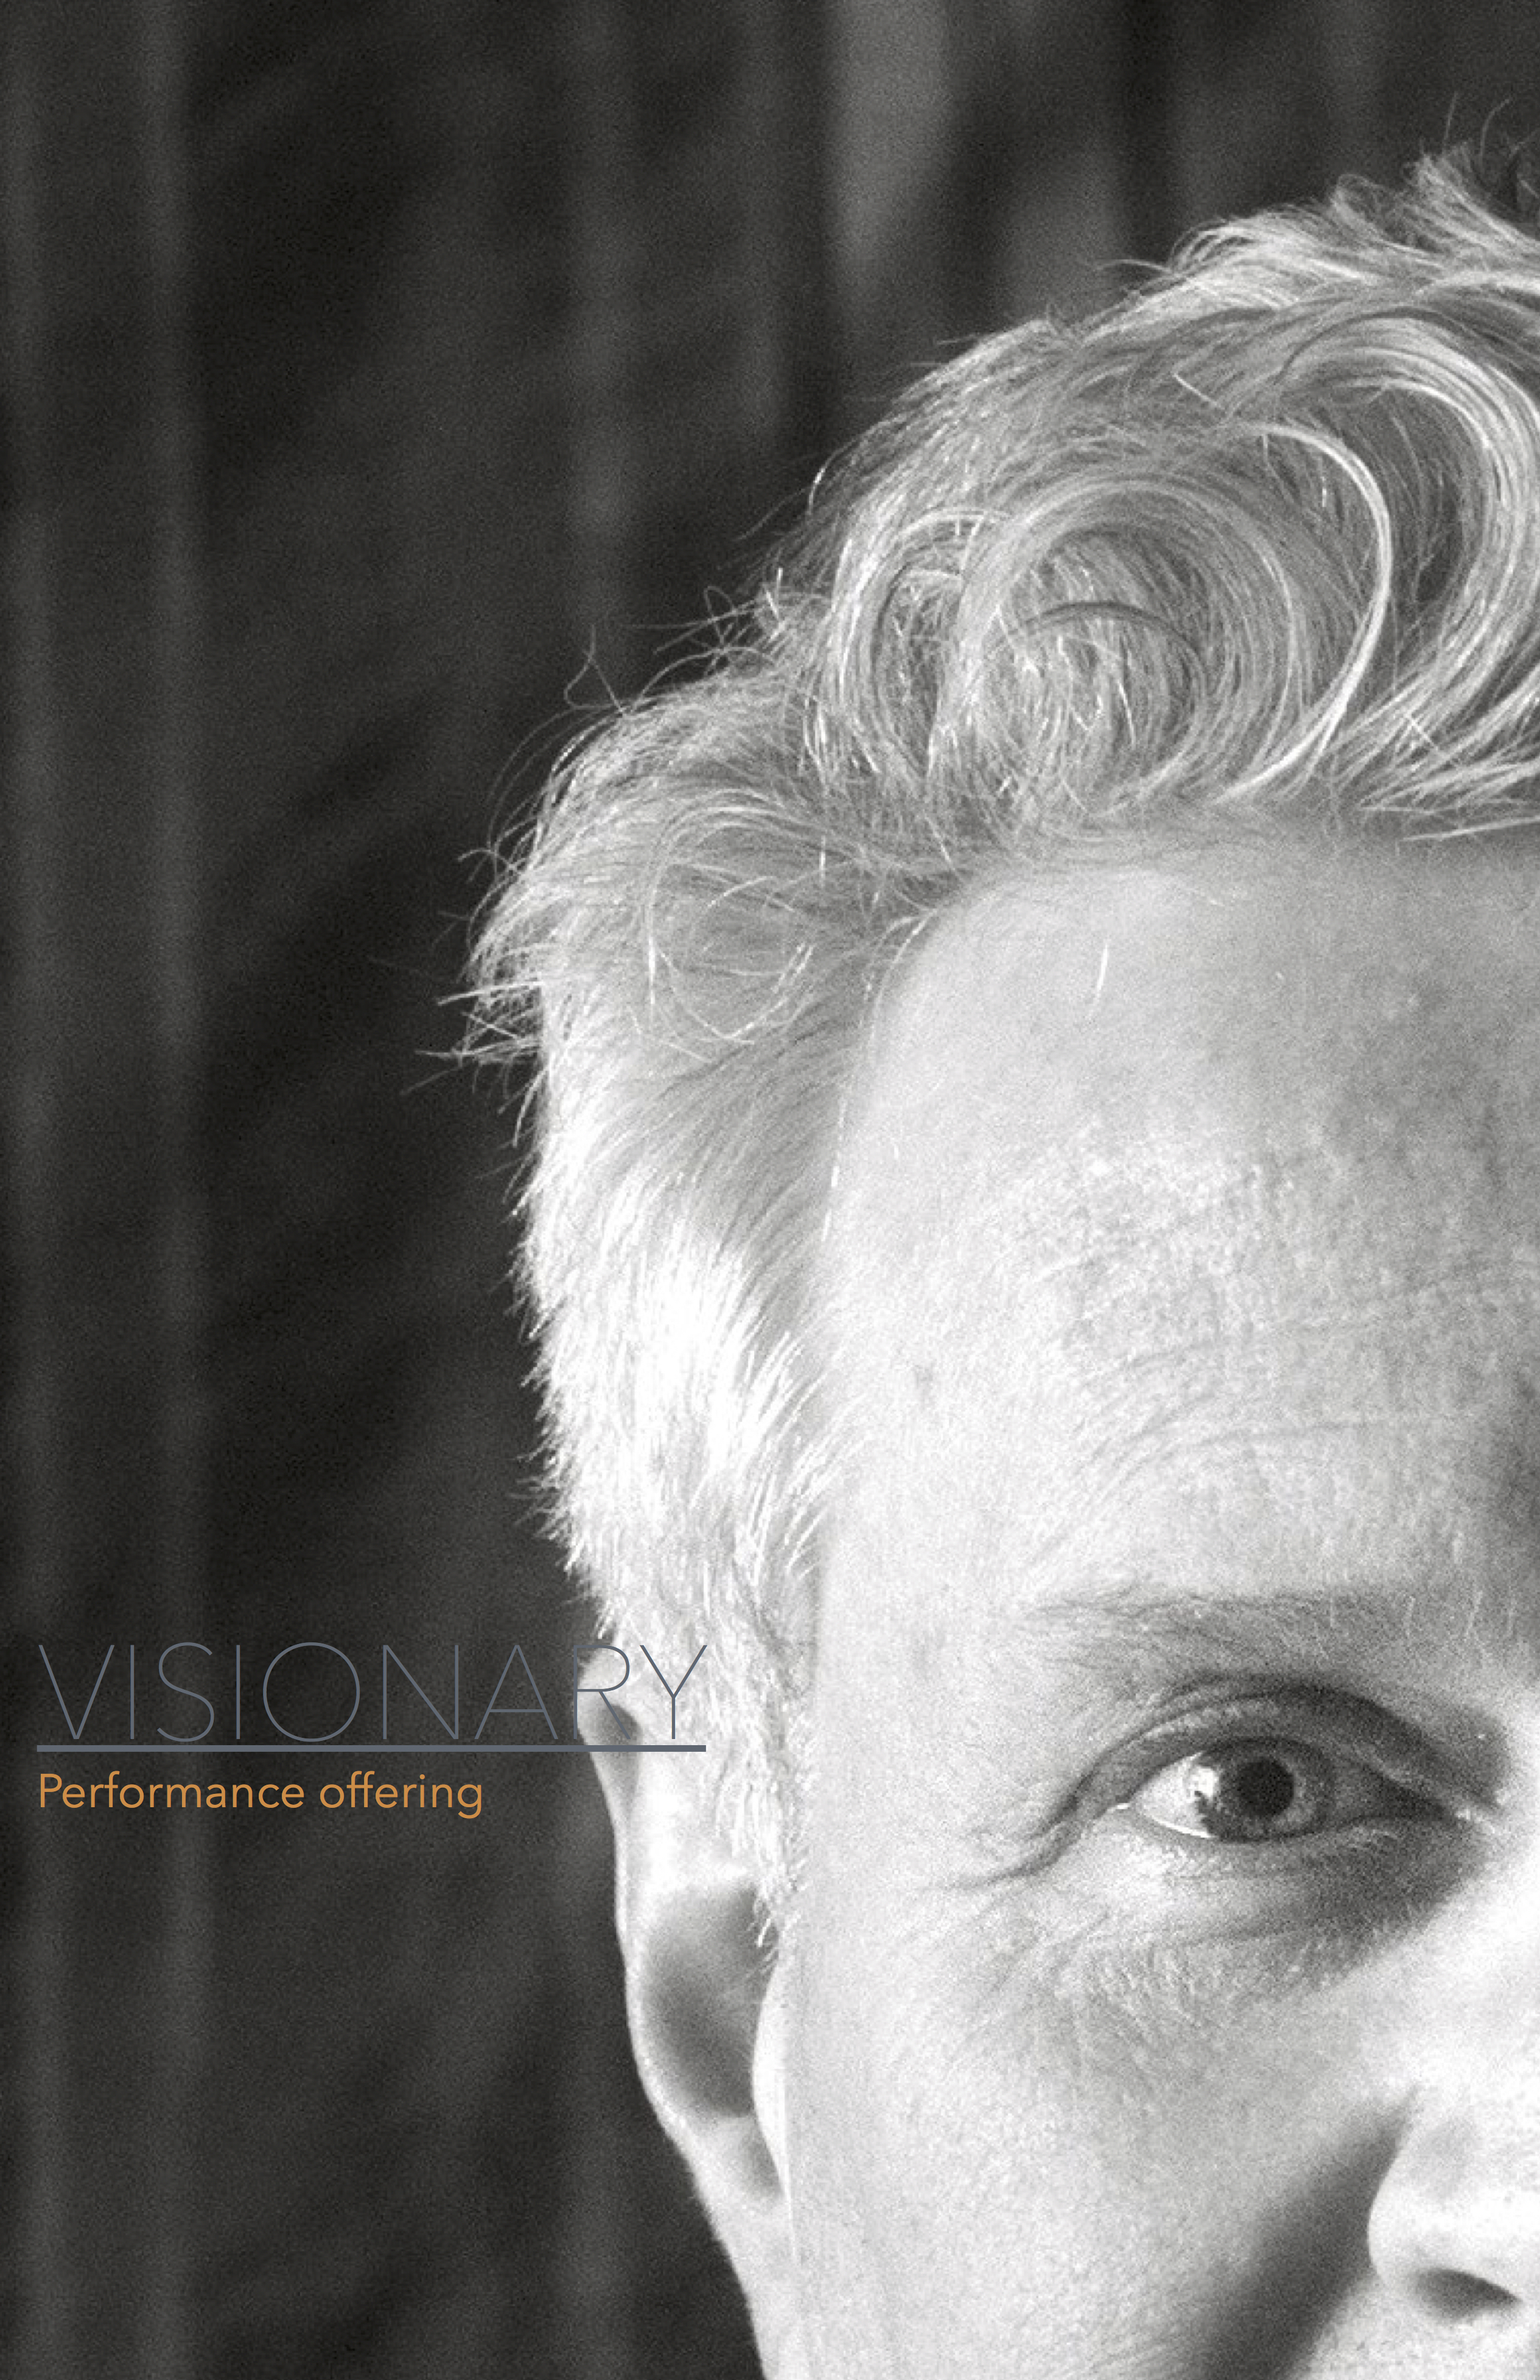 Introducing Visionary jpg.jpg